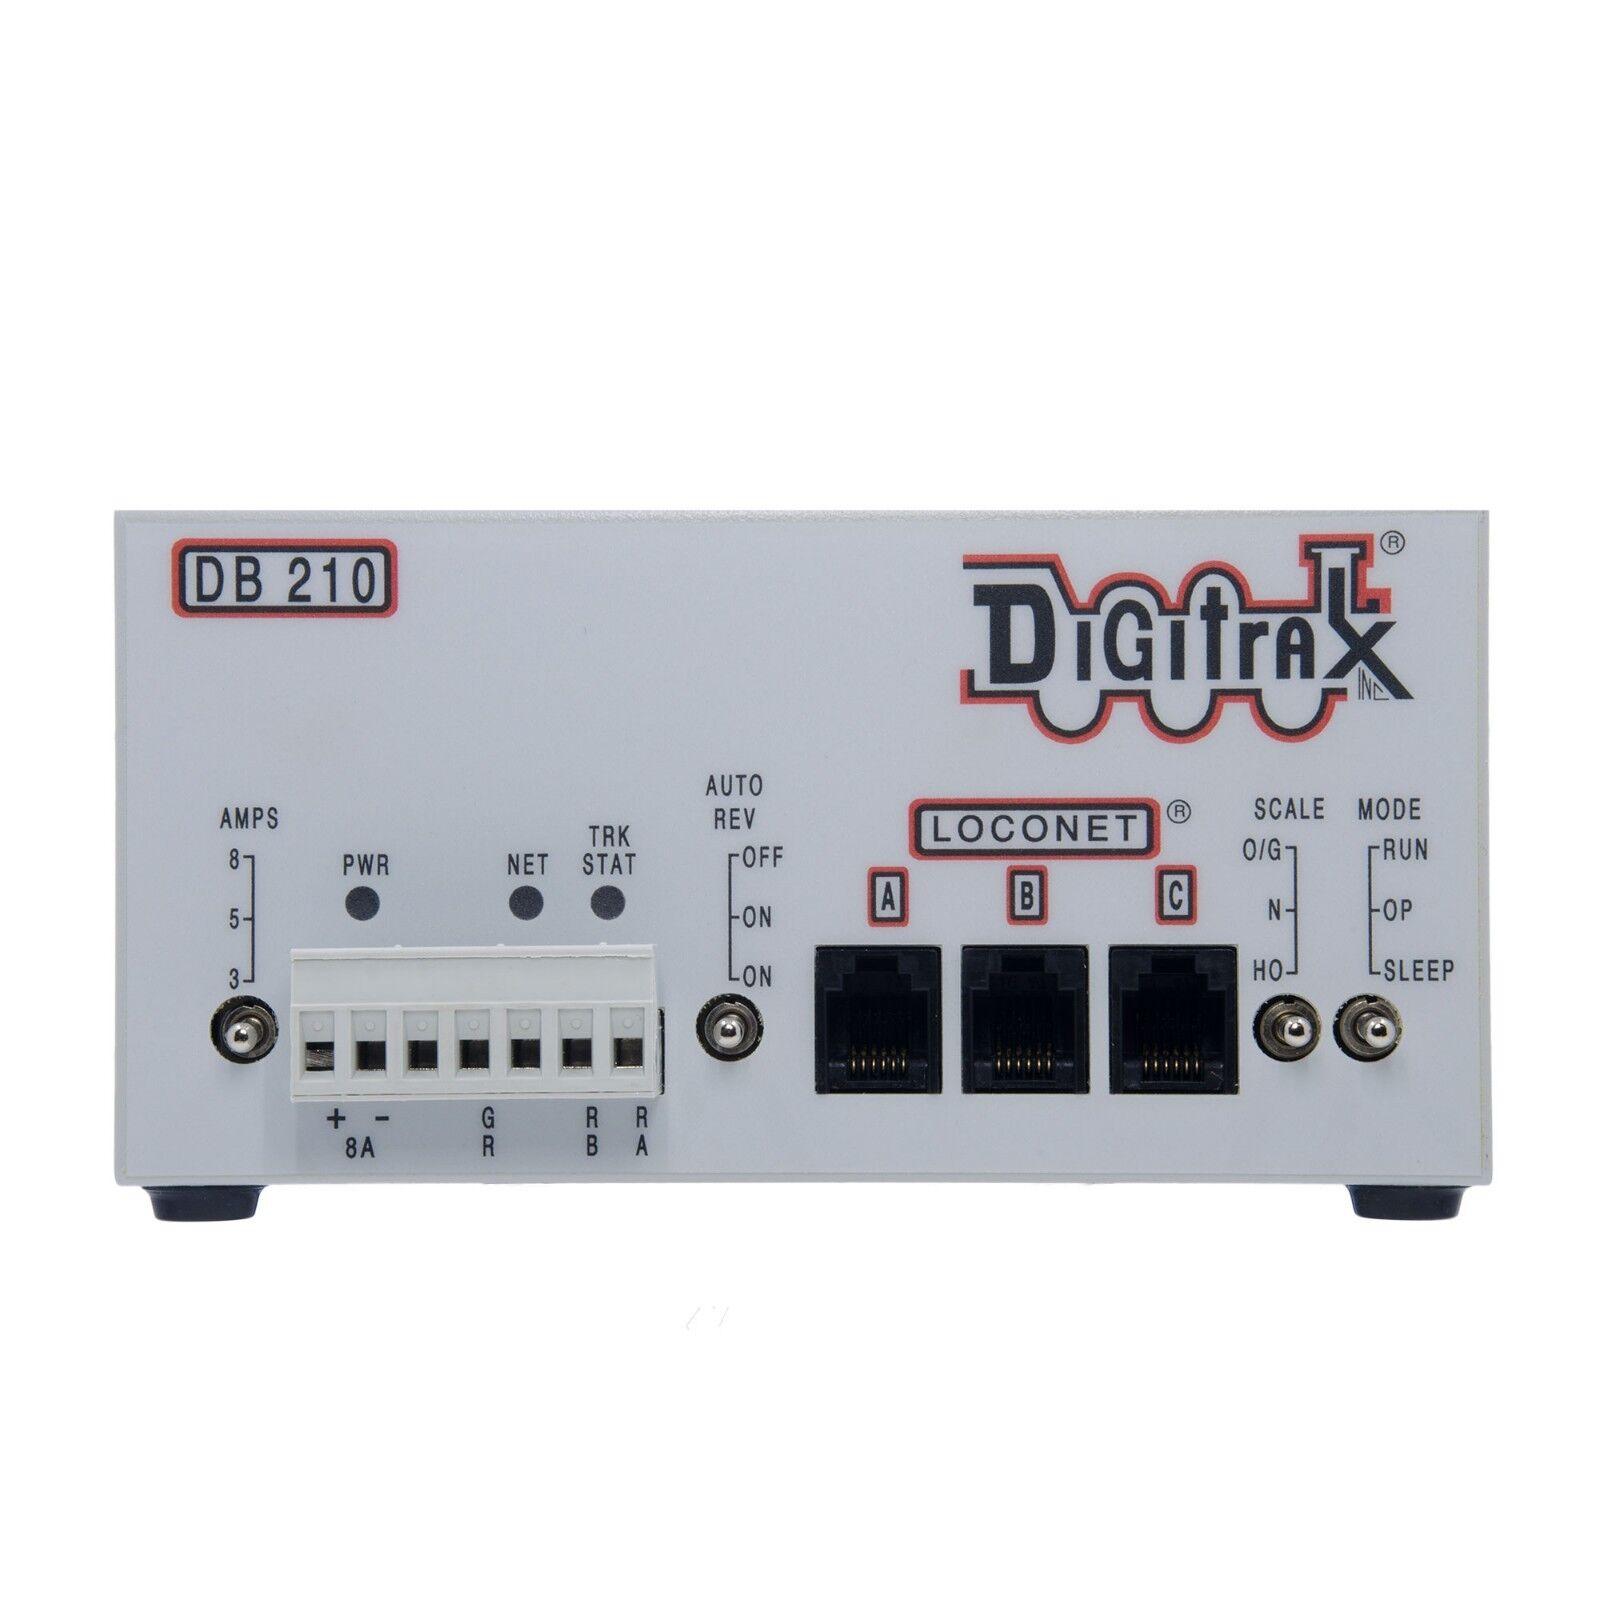 Digitrax  nuovo 2019  DB210 3 3 3 5 8 Amp LocoNet Booster  Auto Reversing  3 Port 2fe0e5